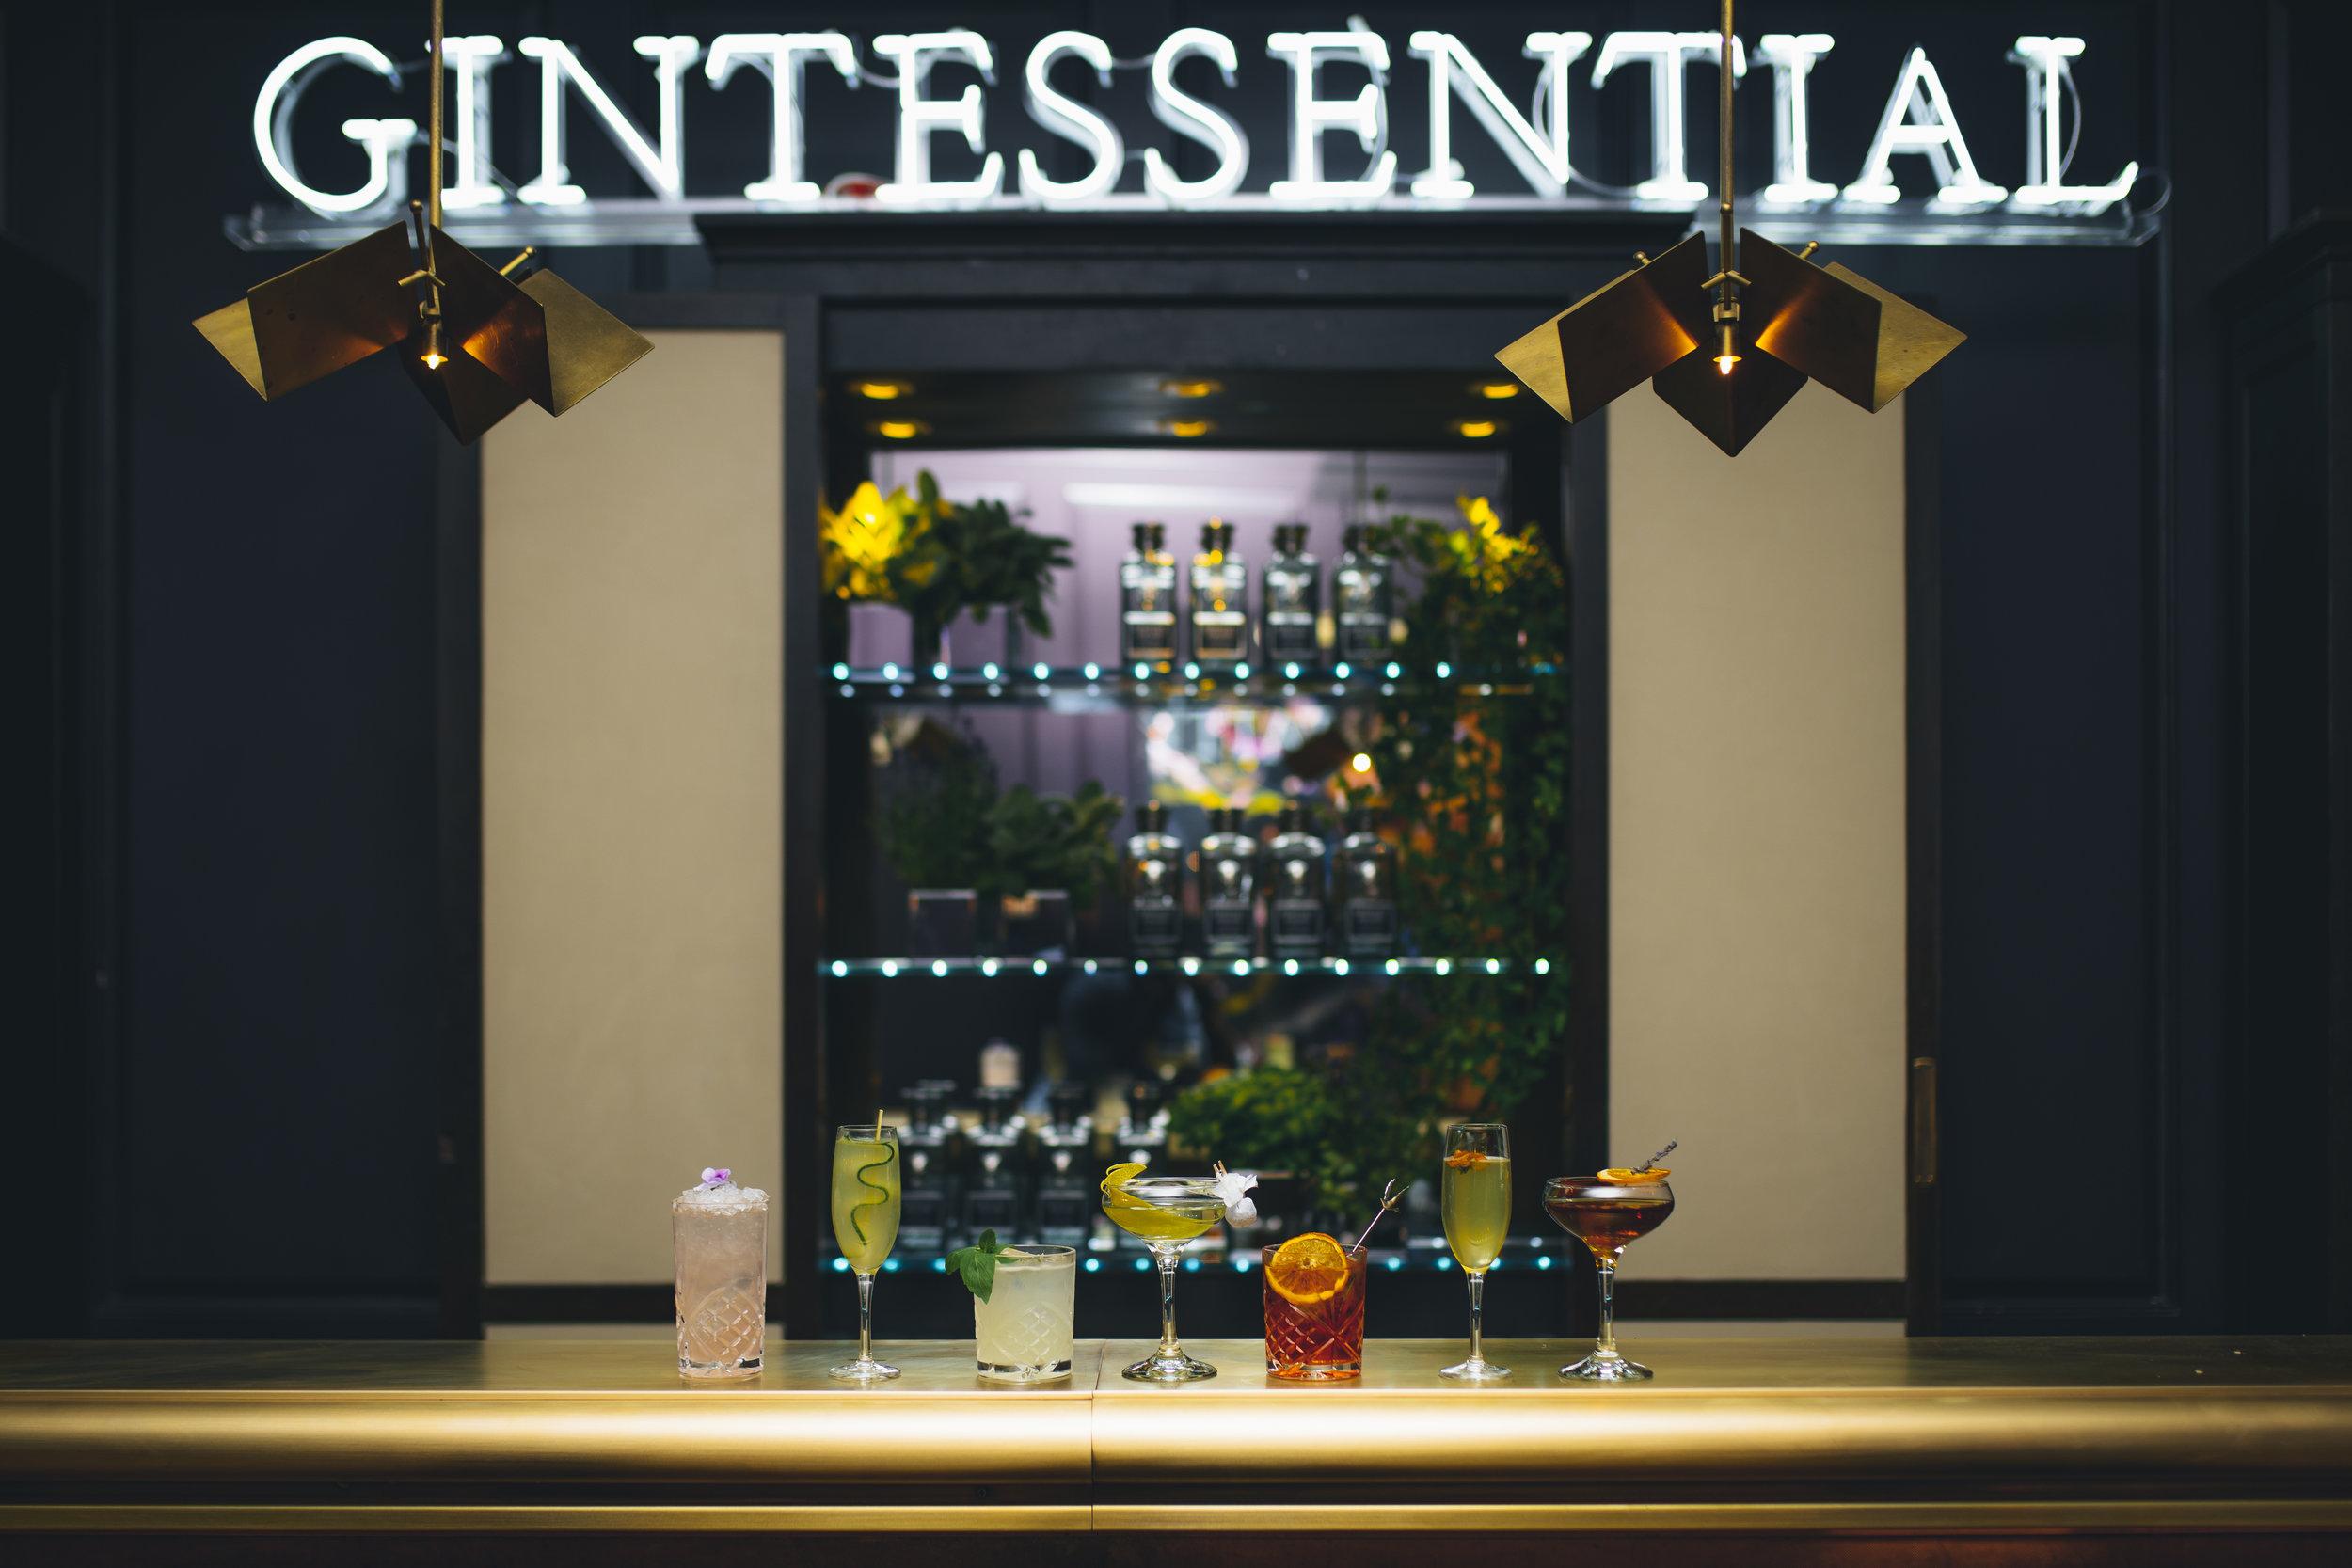 Berkeley Square Gin Gintessential Mortons @lateef.photography-74.jpg